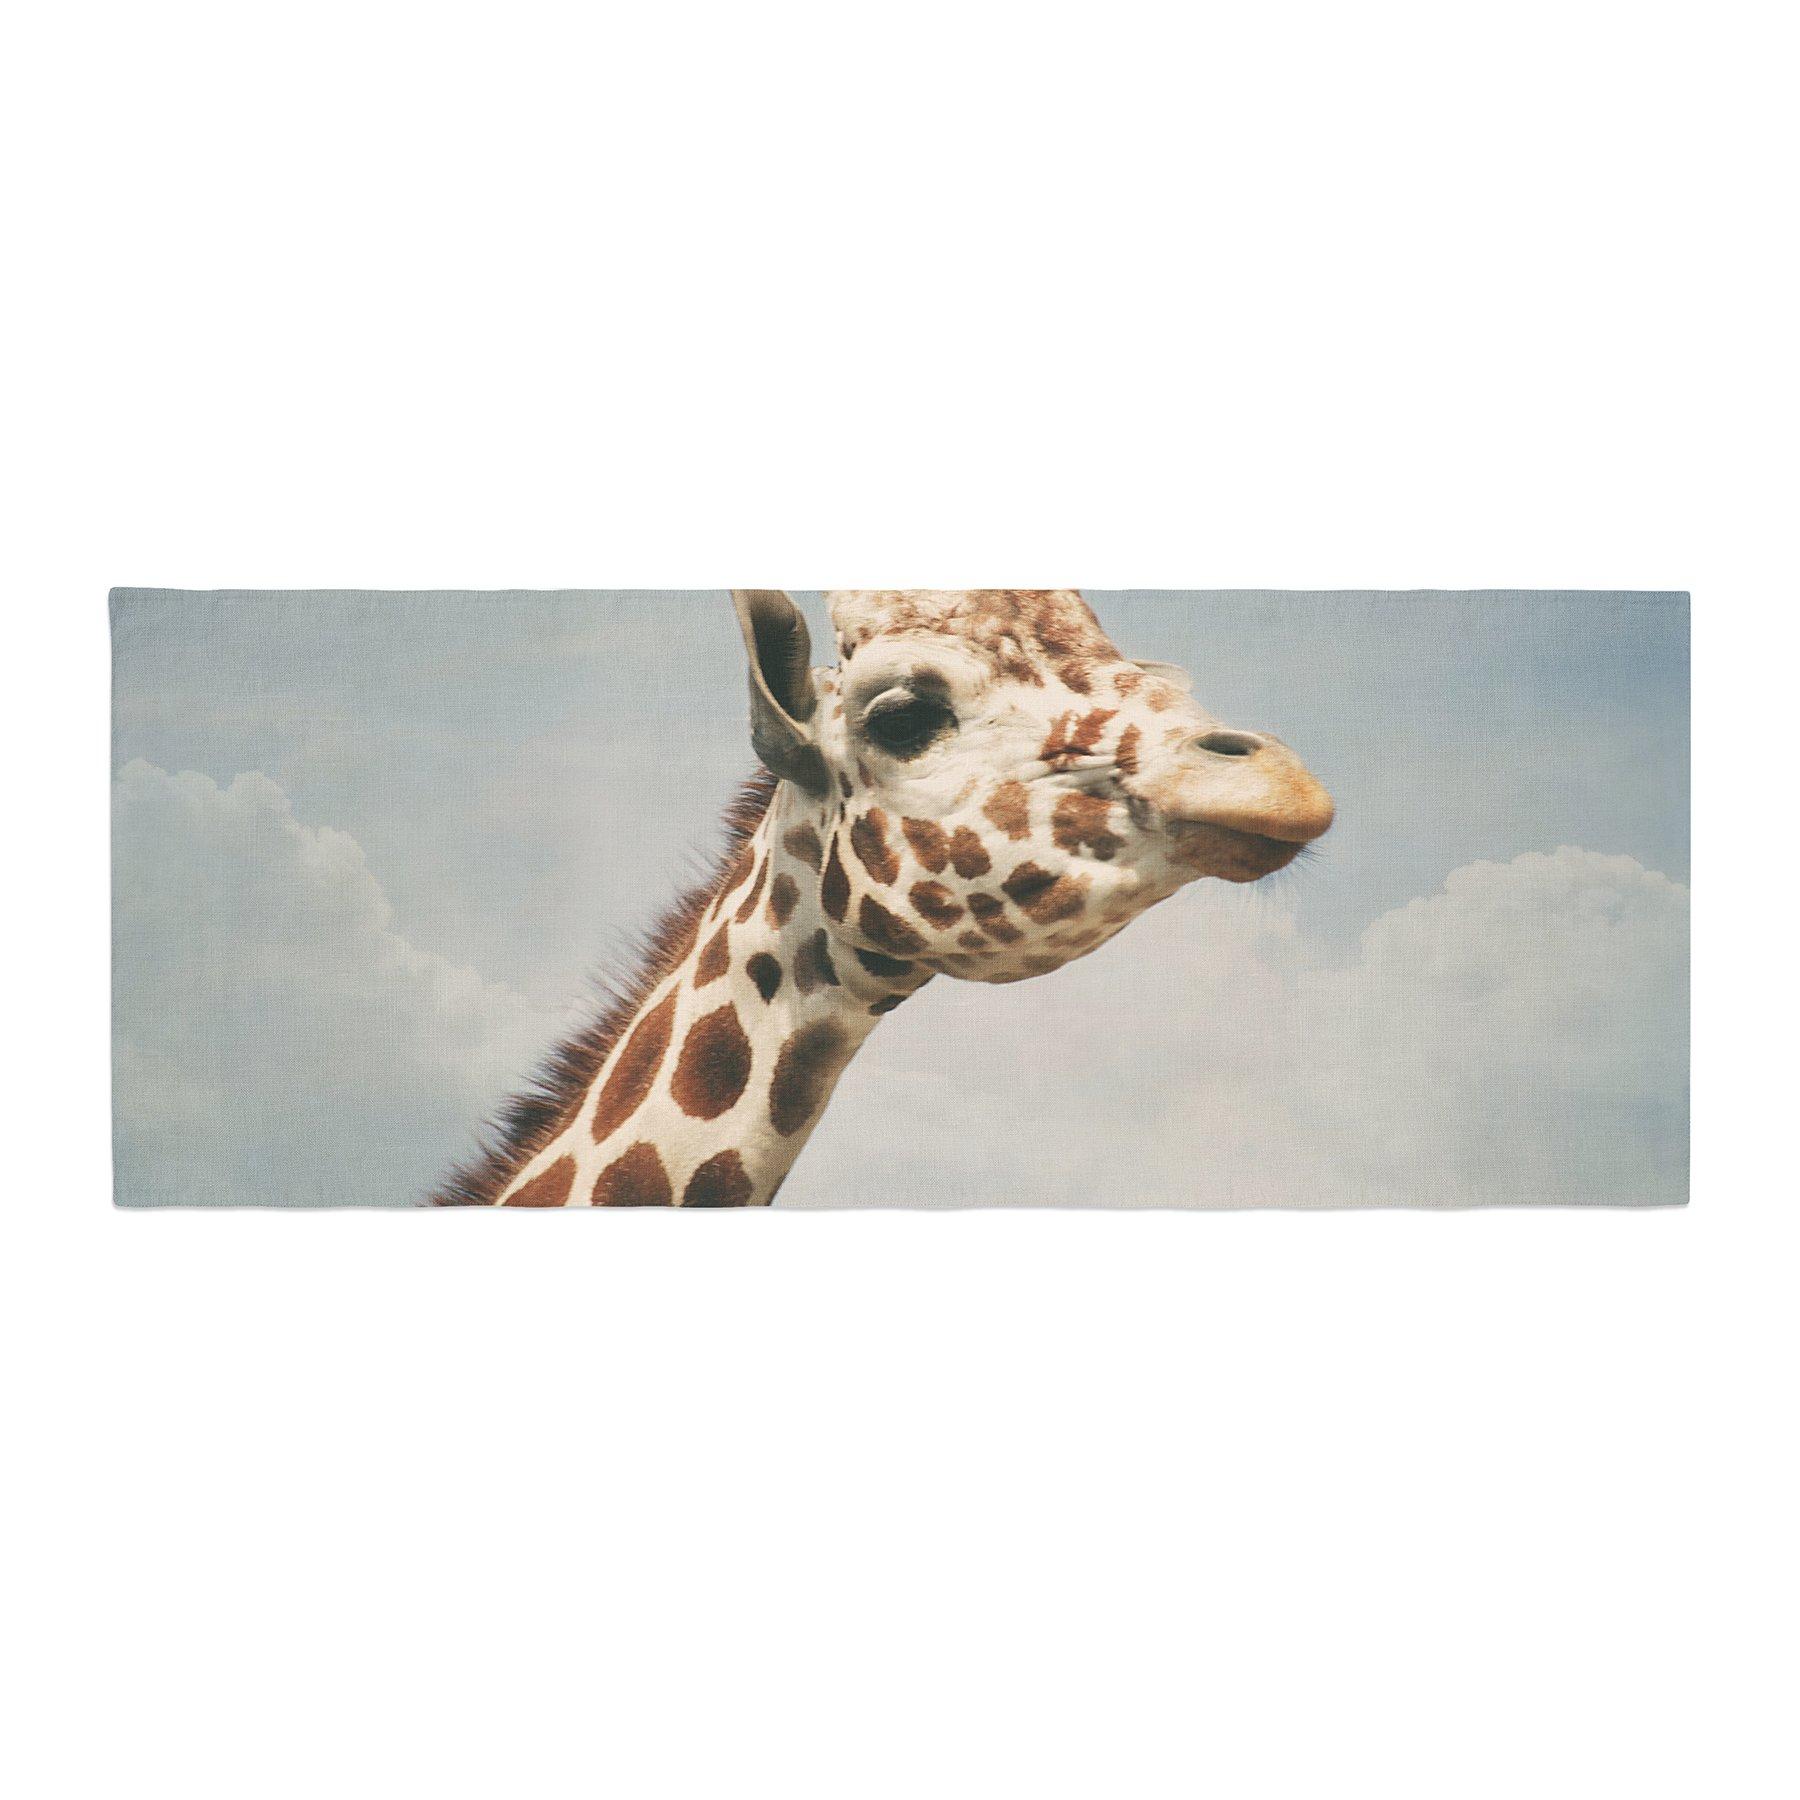 Kess InHouse Angie Turner Giraffe Animal Bed Runner, 34'' x 86''